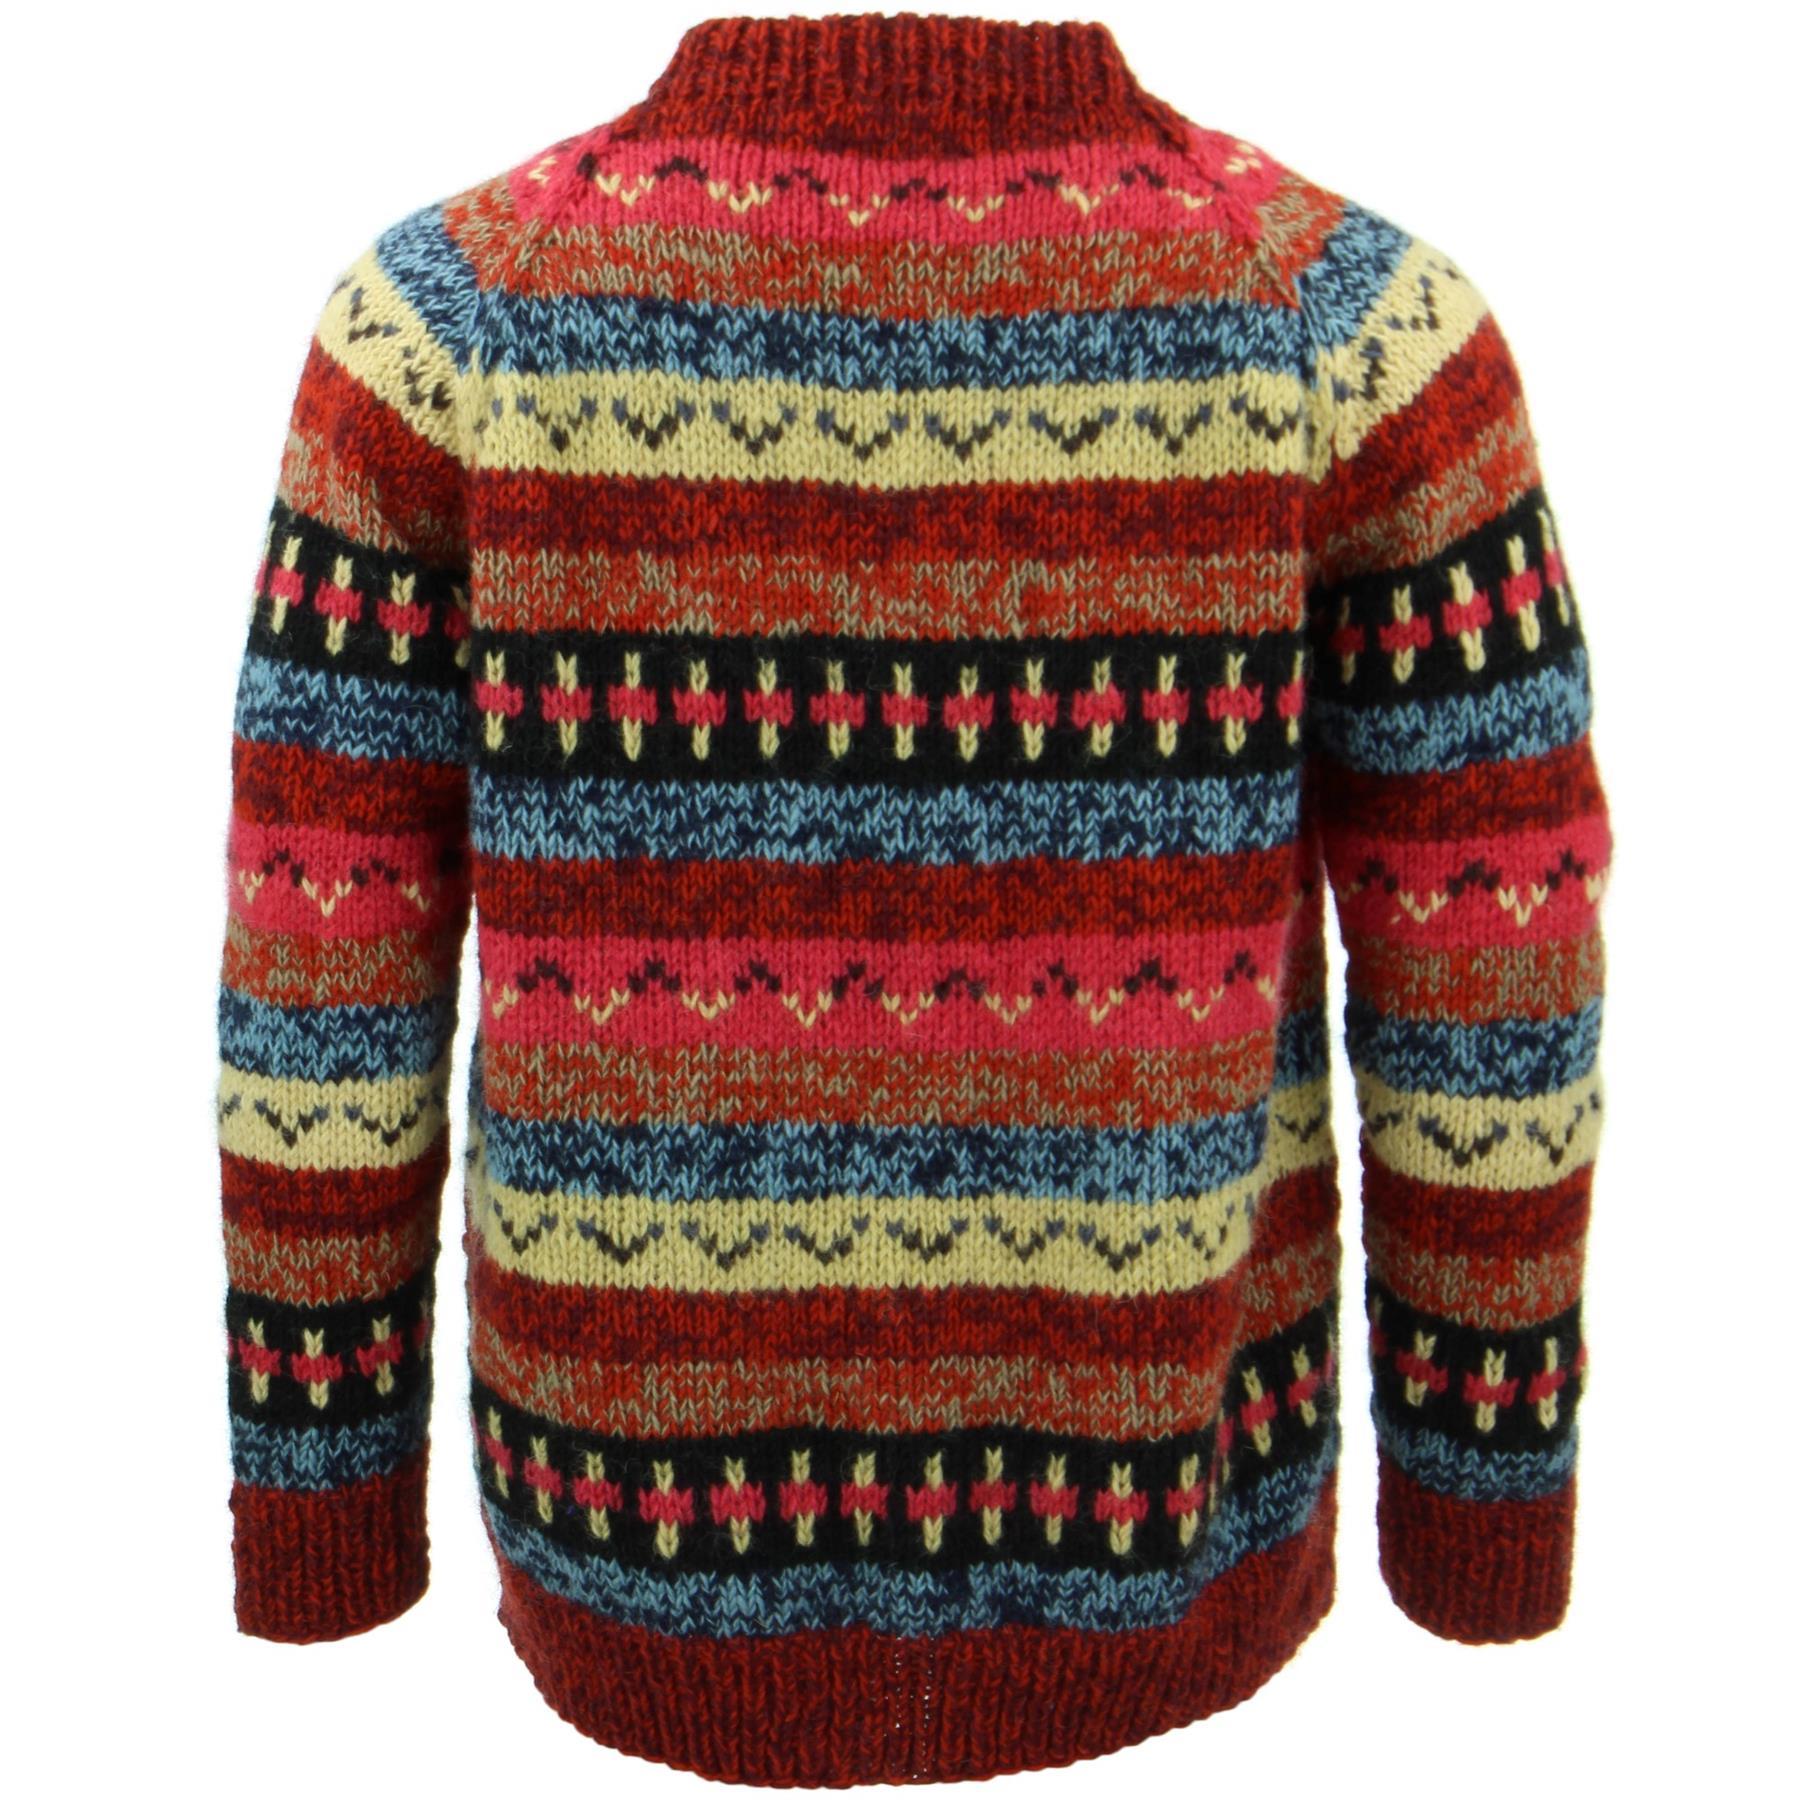 thumbnail 16 - Wool Knit Jumper Sweater Pullover Fairisle Nordic Abstract Warm Nepal Loose